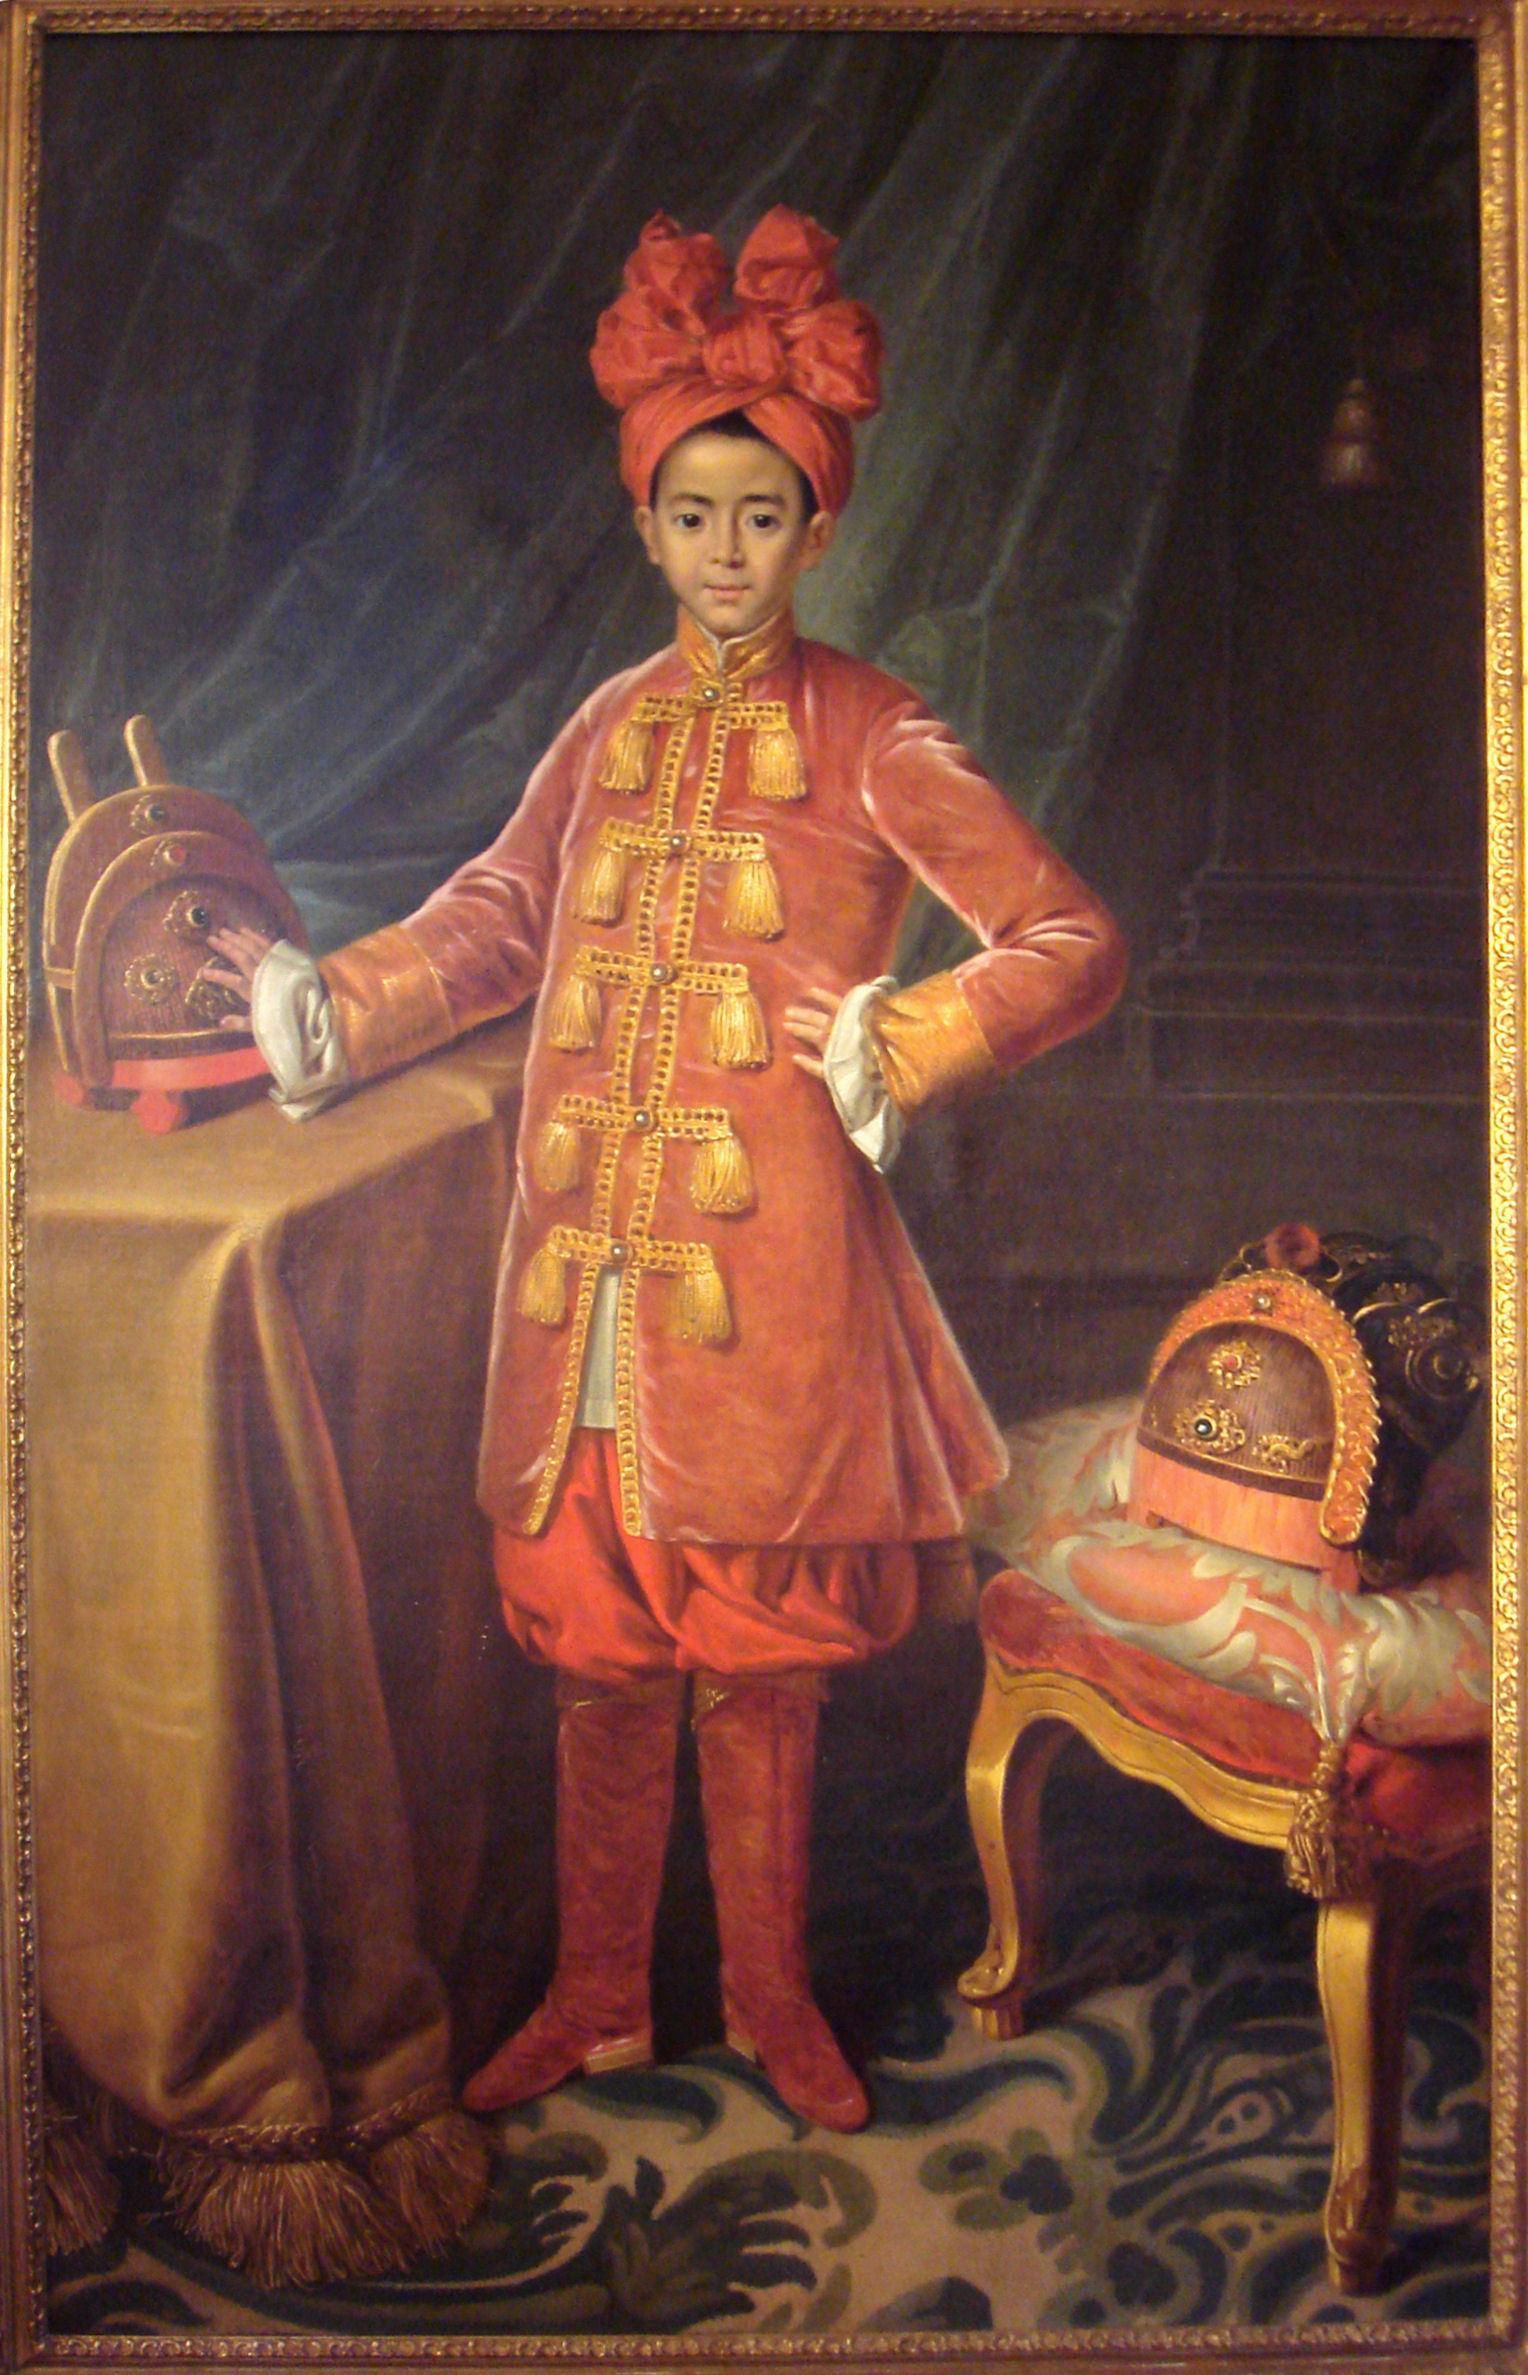 Emperor Gia Long, Vietnam